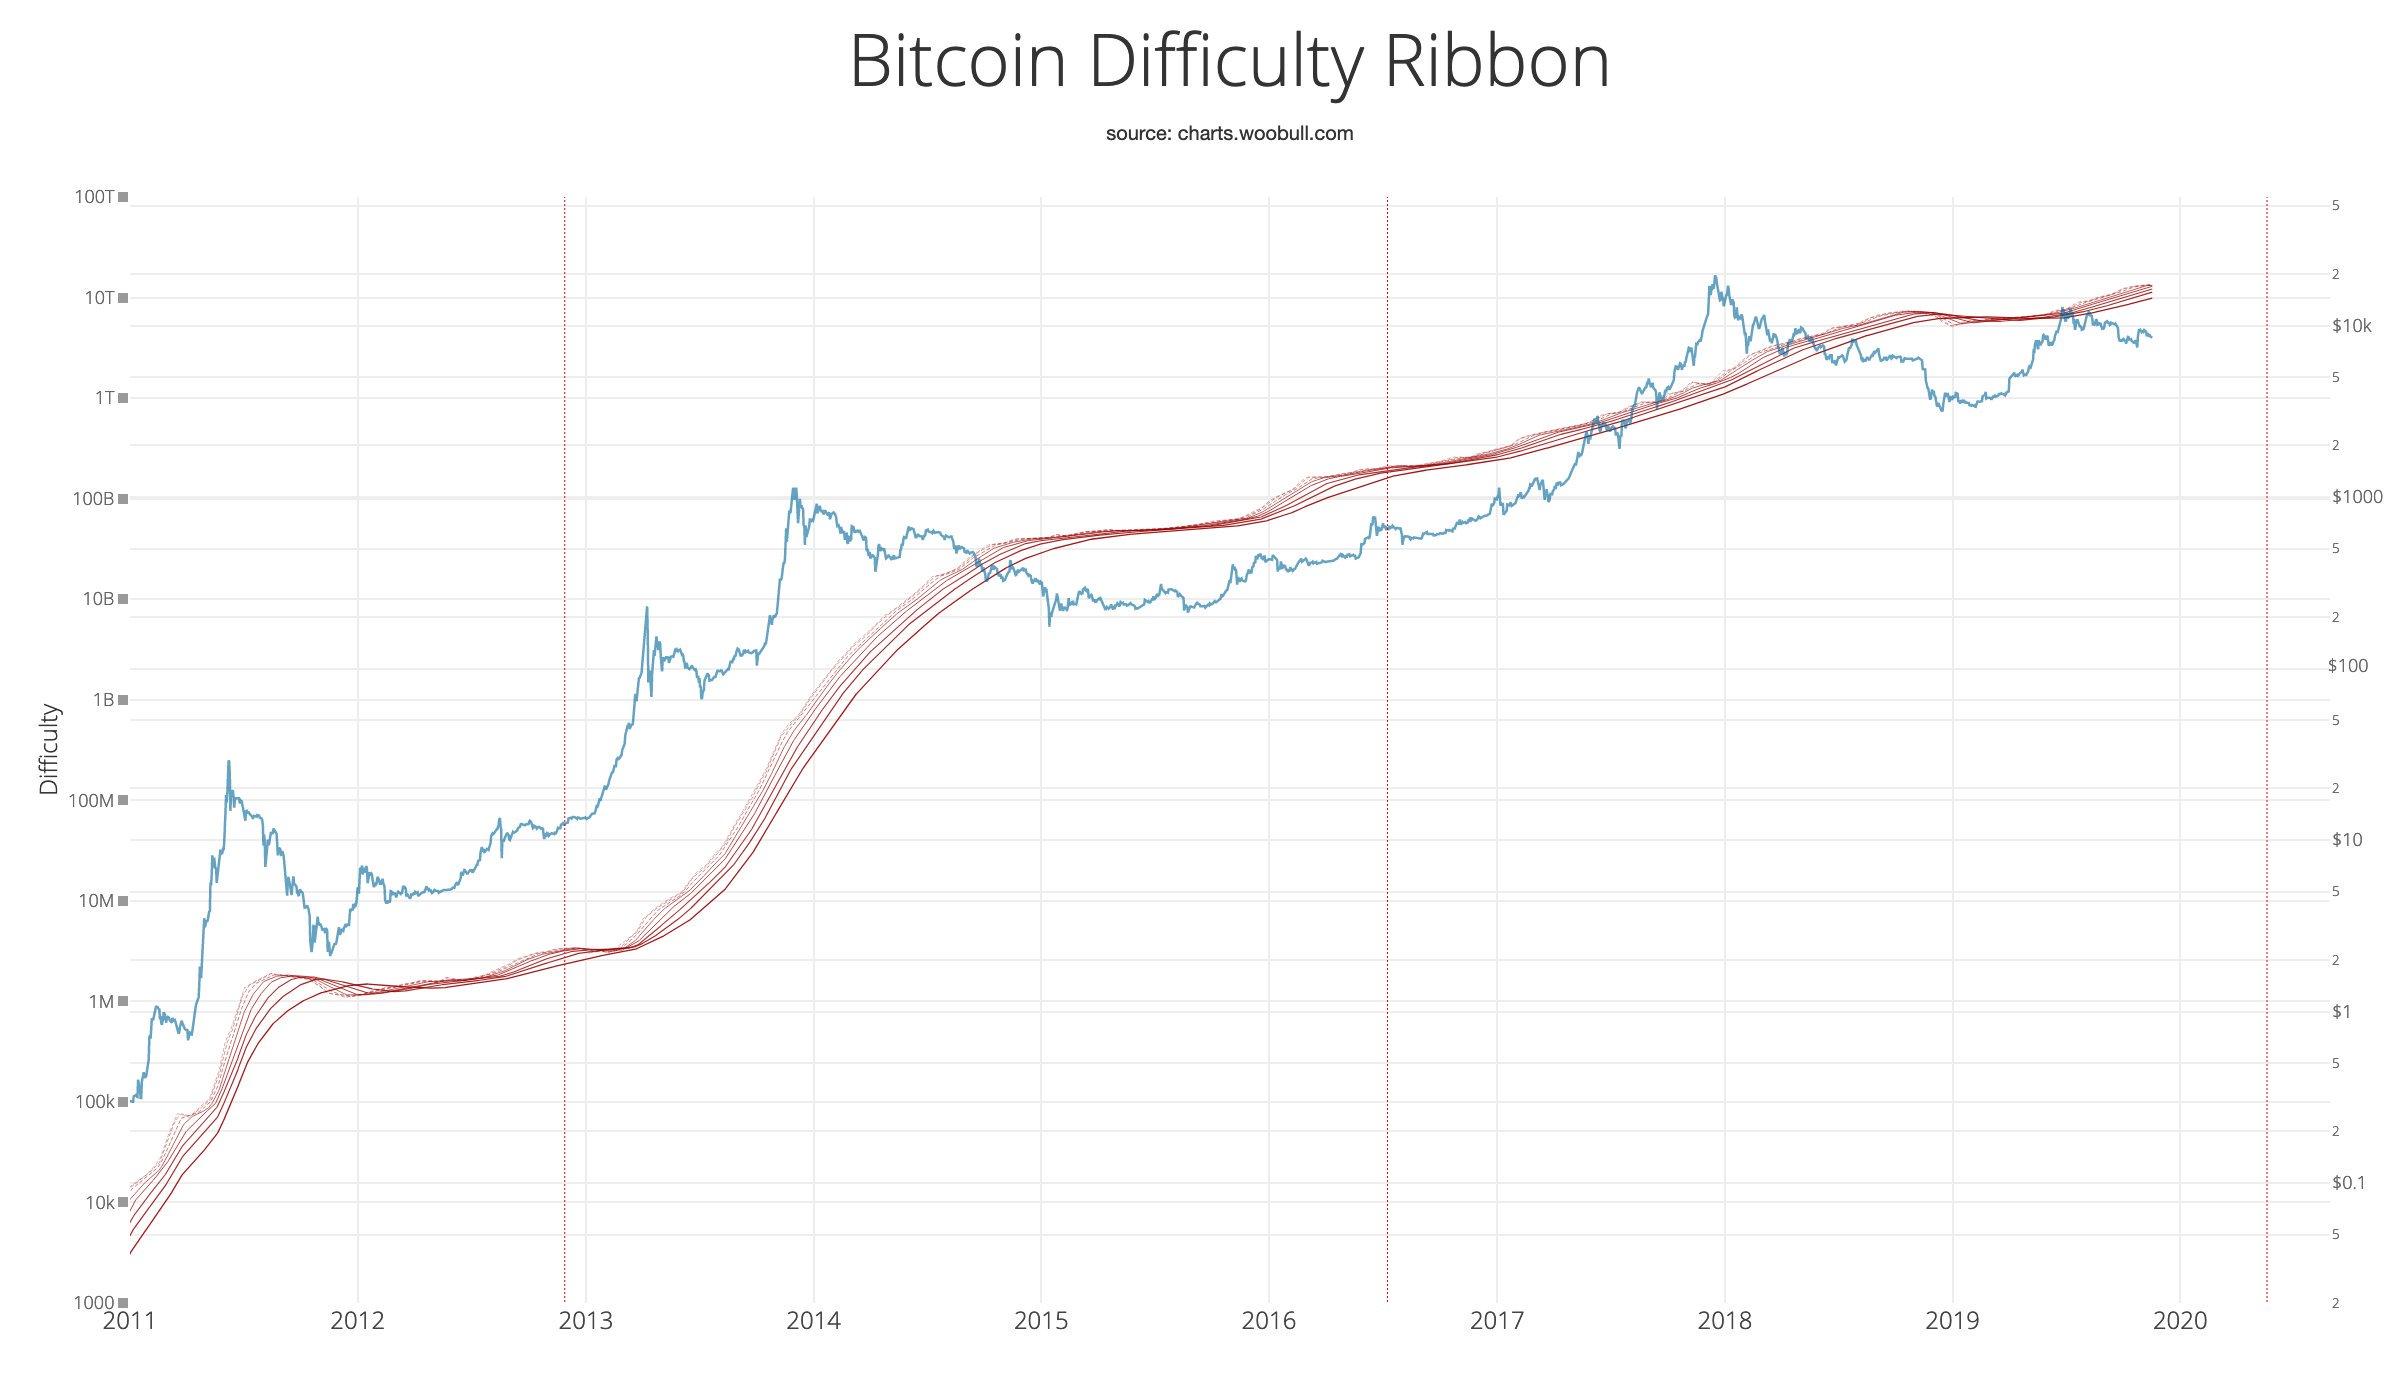 BTC difficulty ribbon